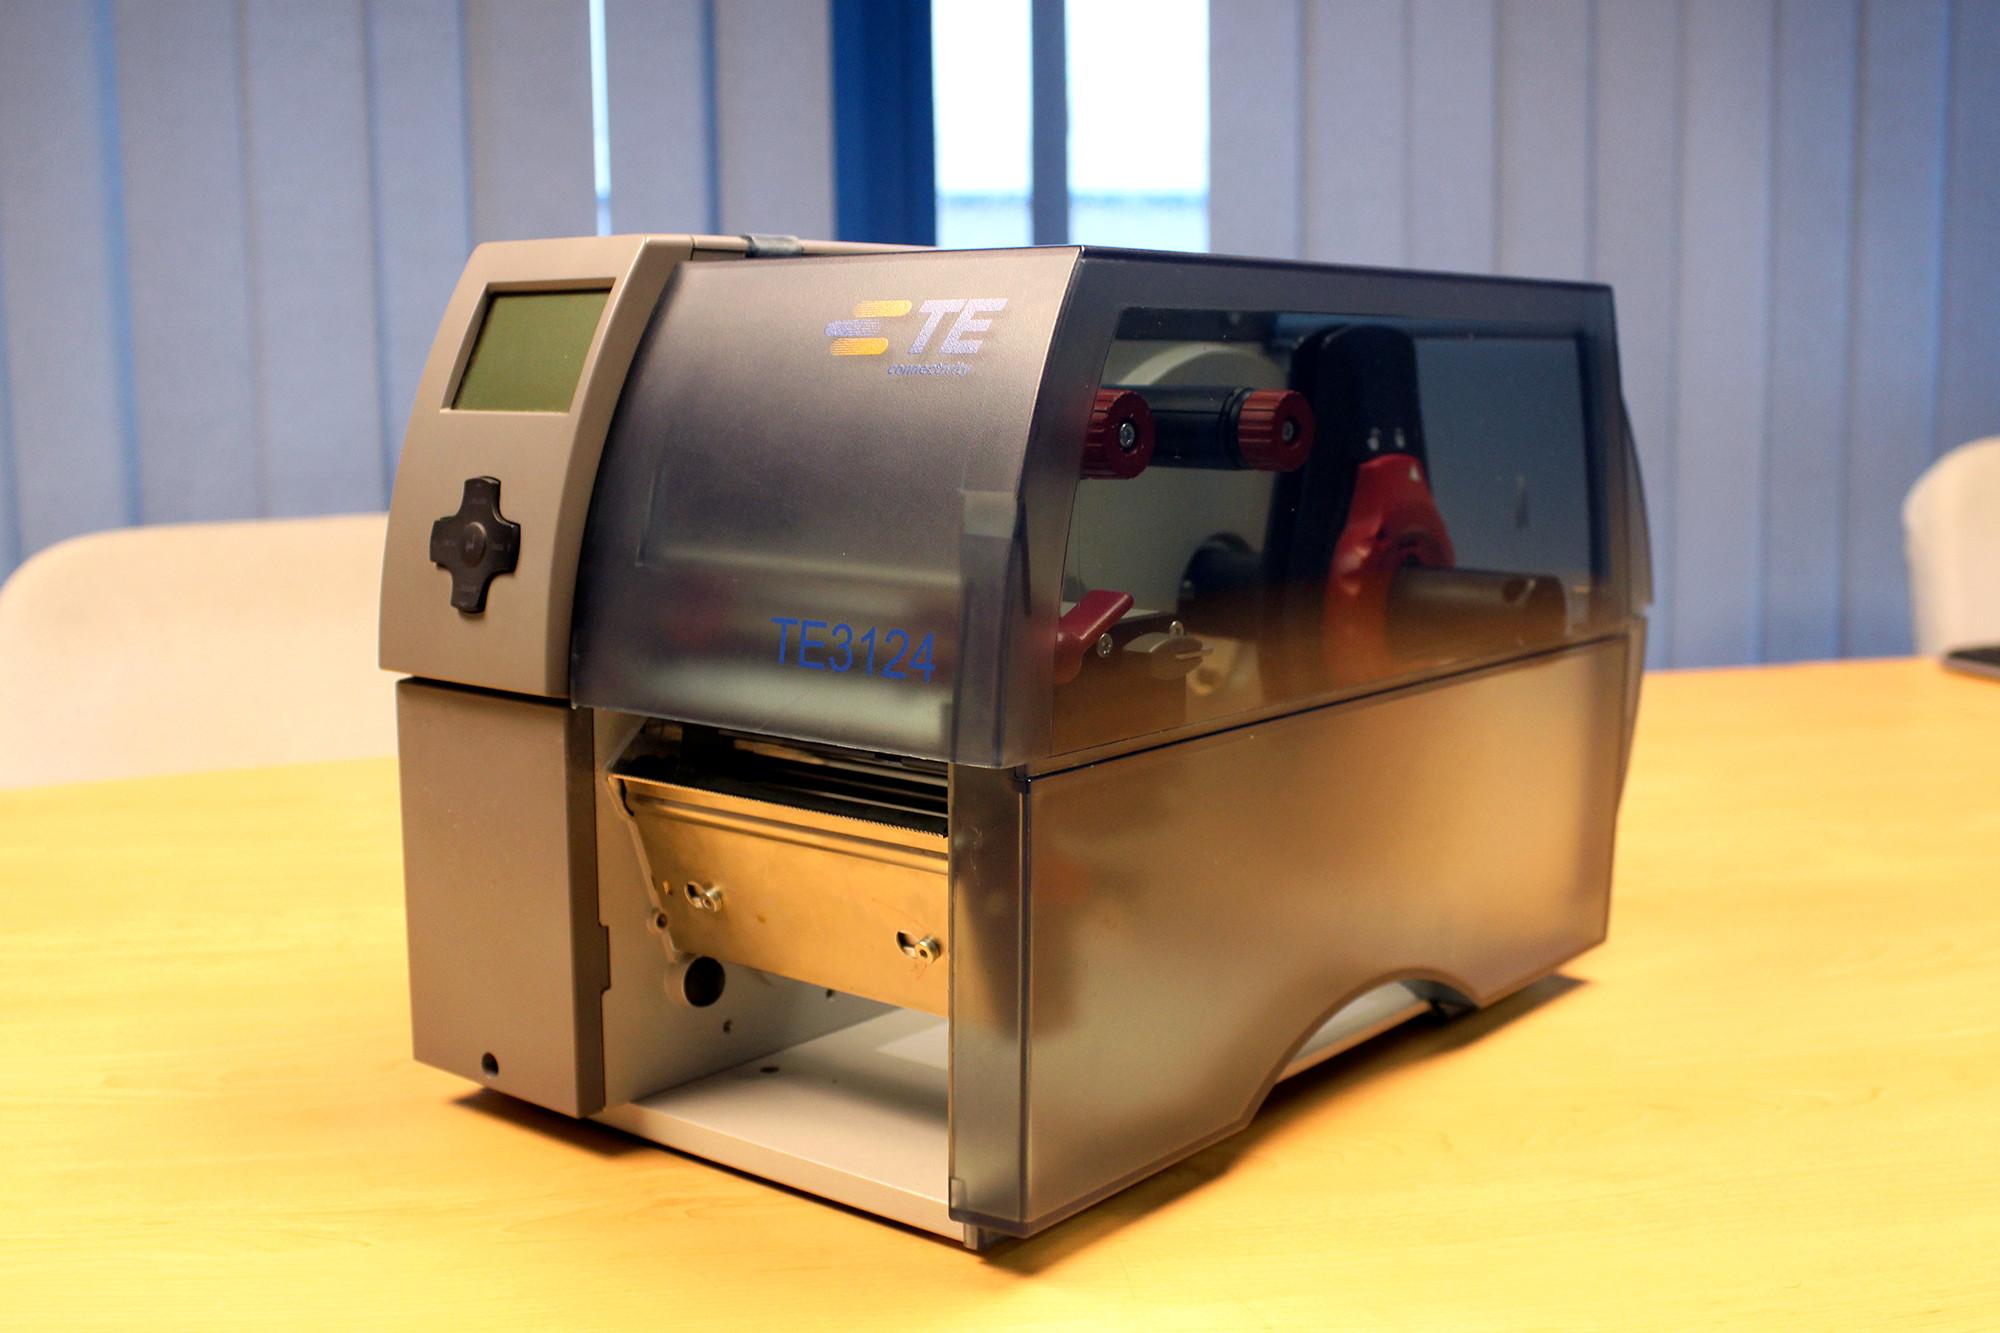 TE3124 Printer